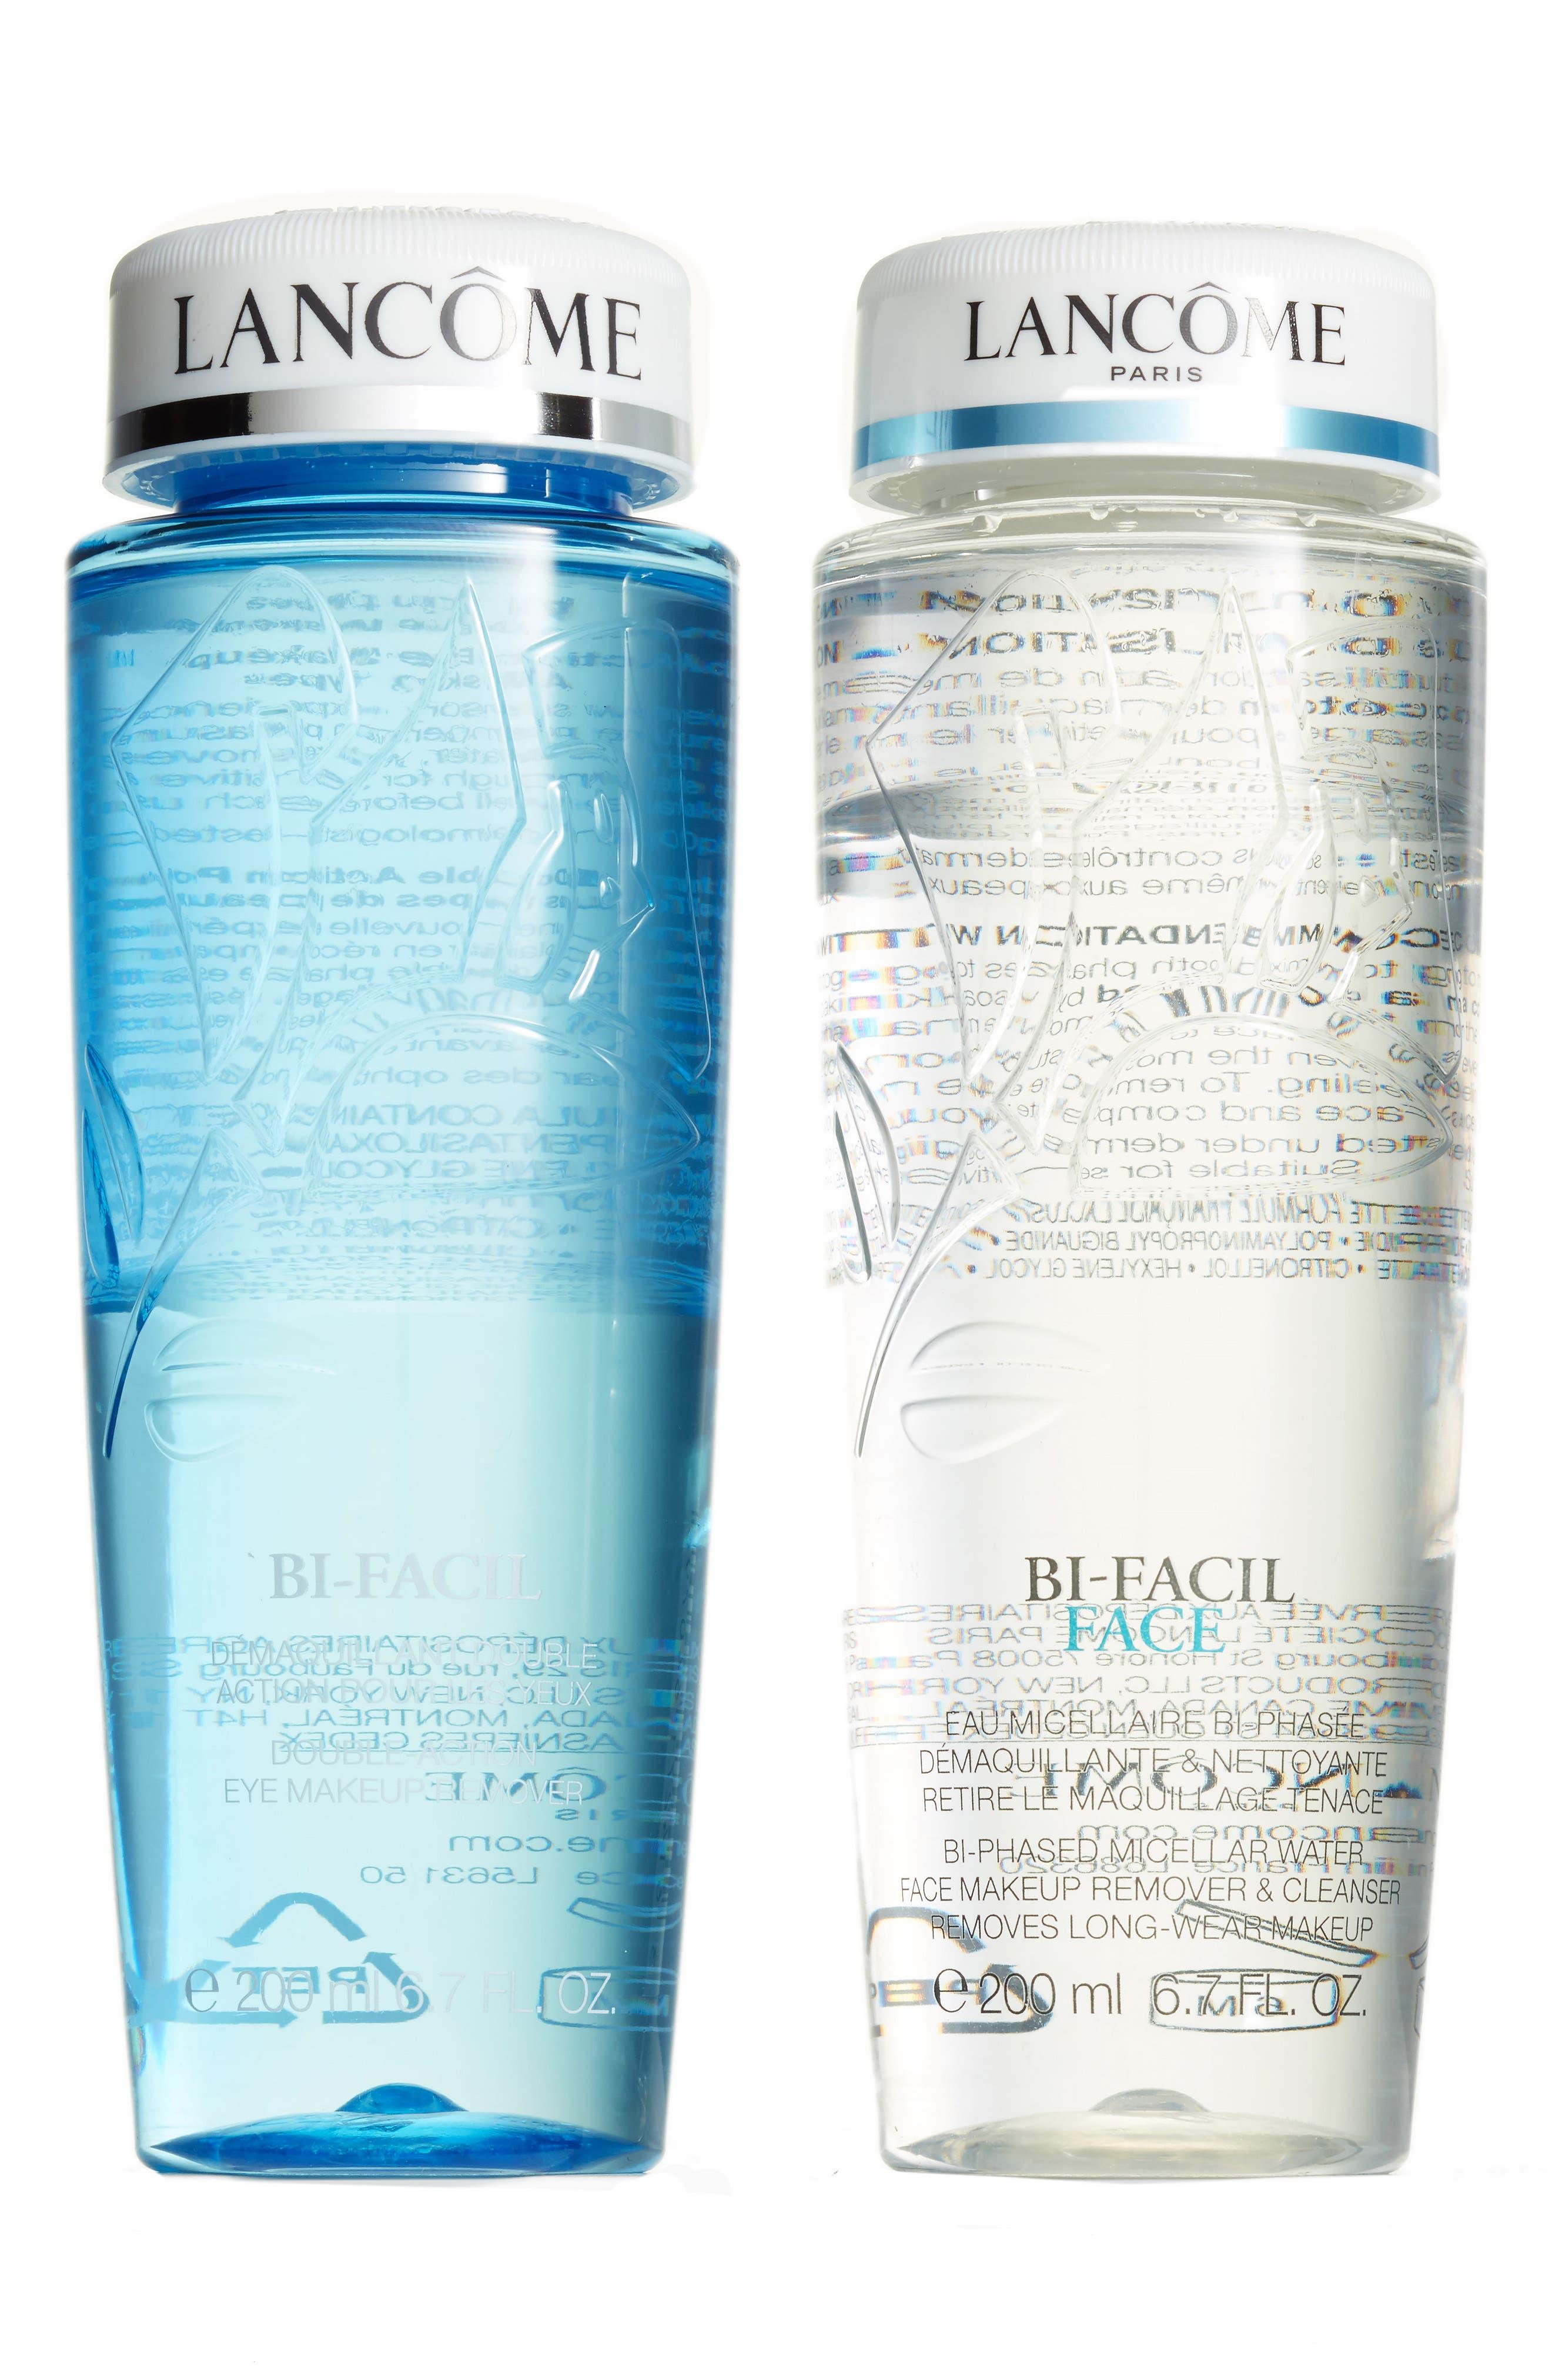 Lancôme Bi-Facil Makeup Remover Duo (Nordstrom Online Exclusive) ($80 Value)